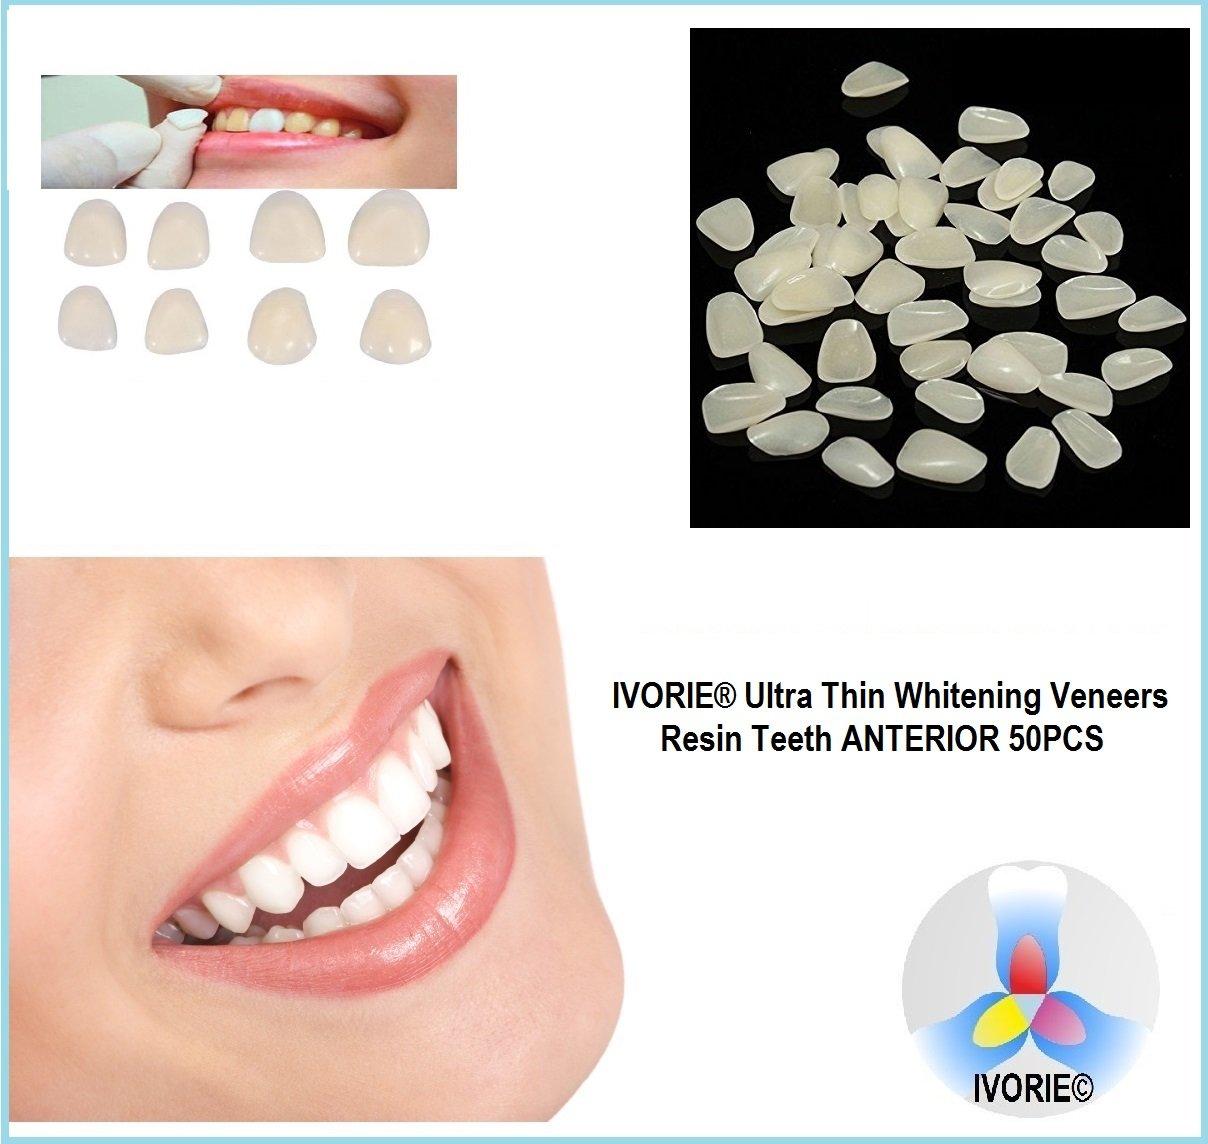 IVORIE Ultra Thin Whitening Veneers Resin Teeth Anterior 50PCS (Shade A2 Upper)